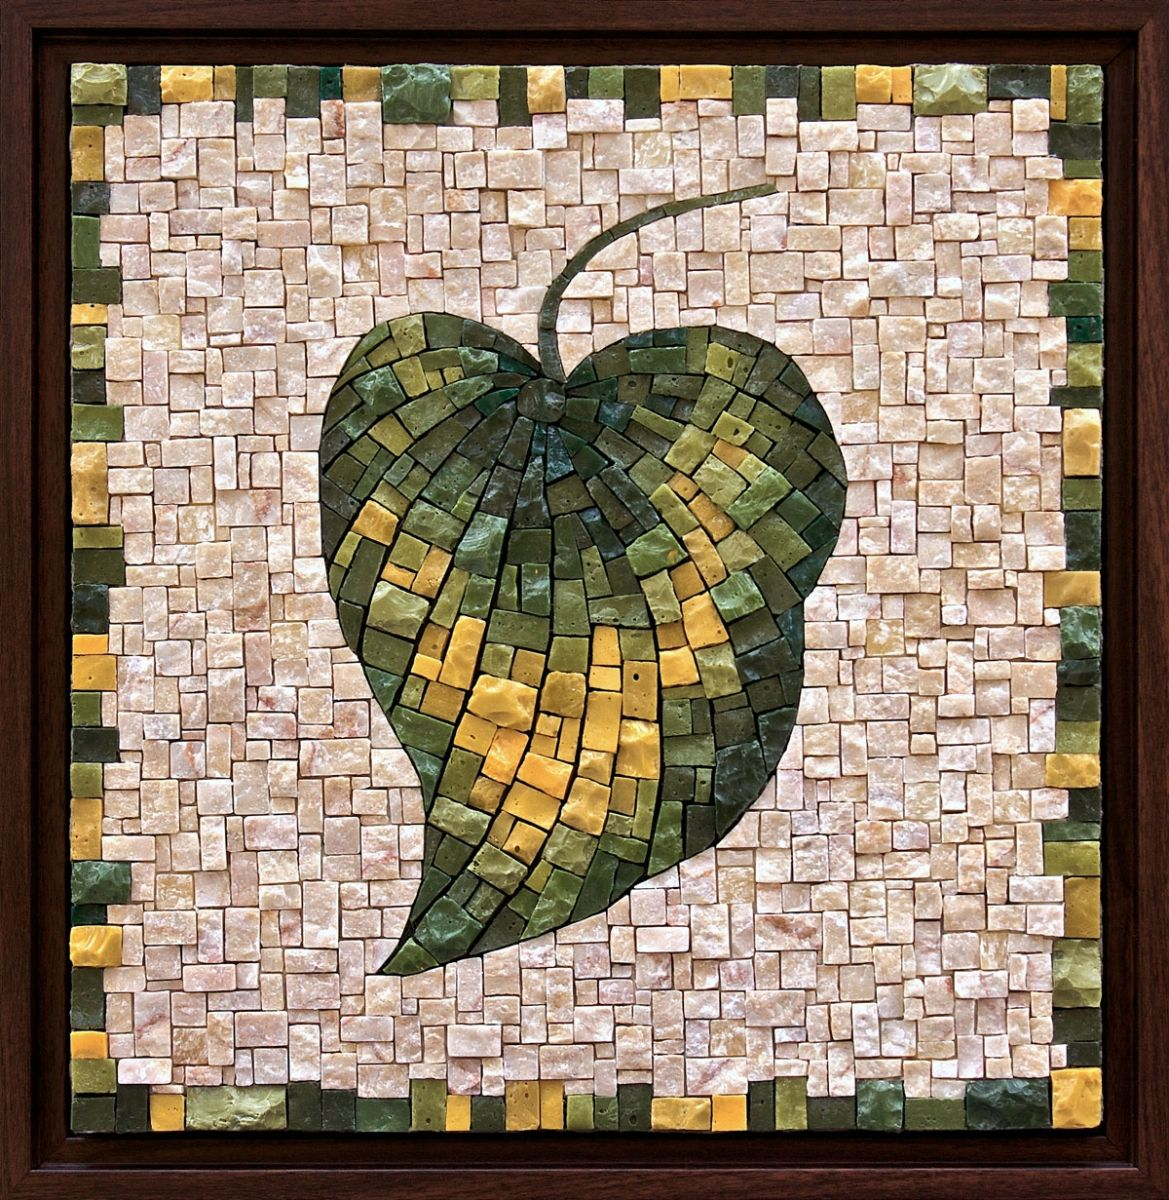 Jacqueline Iskander Mosaic Art